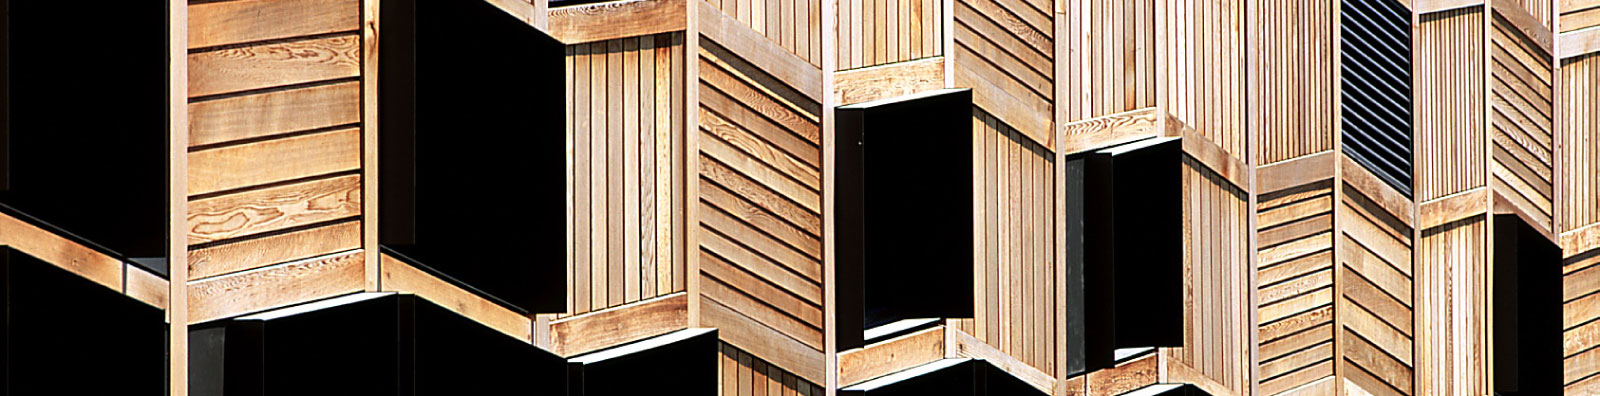 H2o Architects Melbourne-RMIT Building 513-03